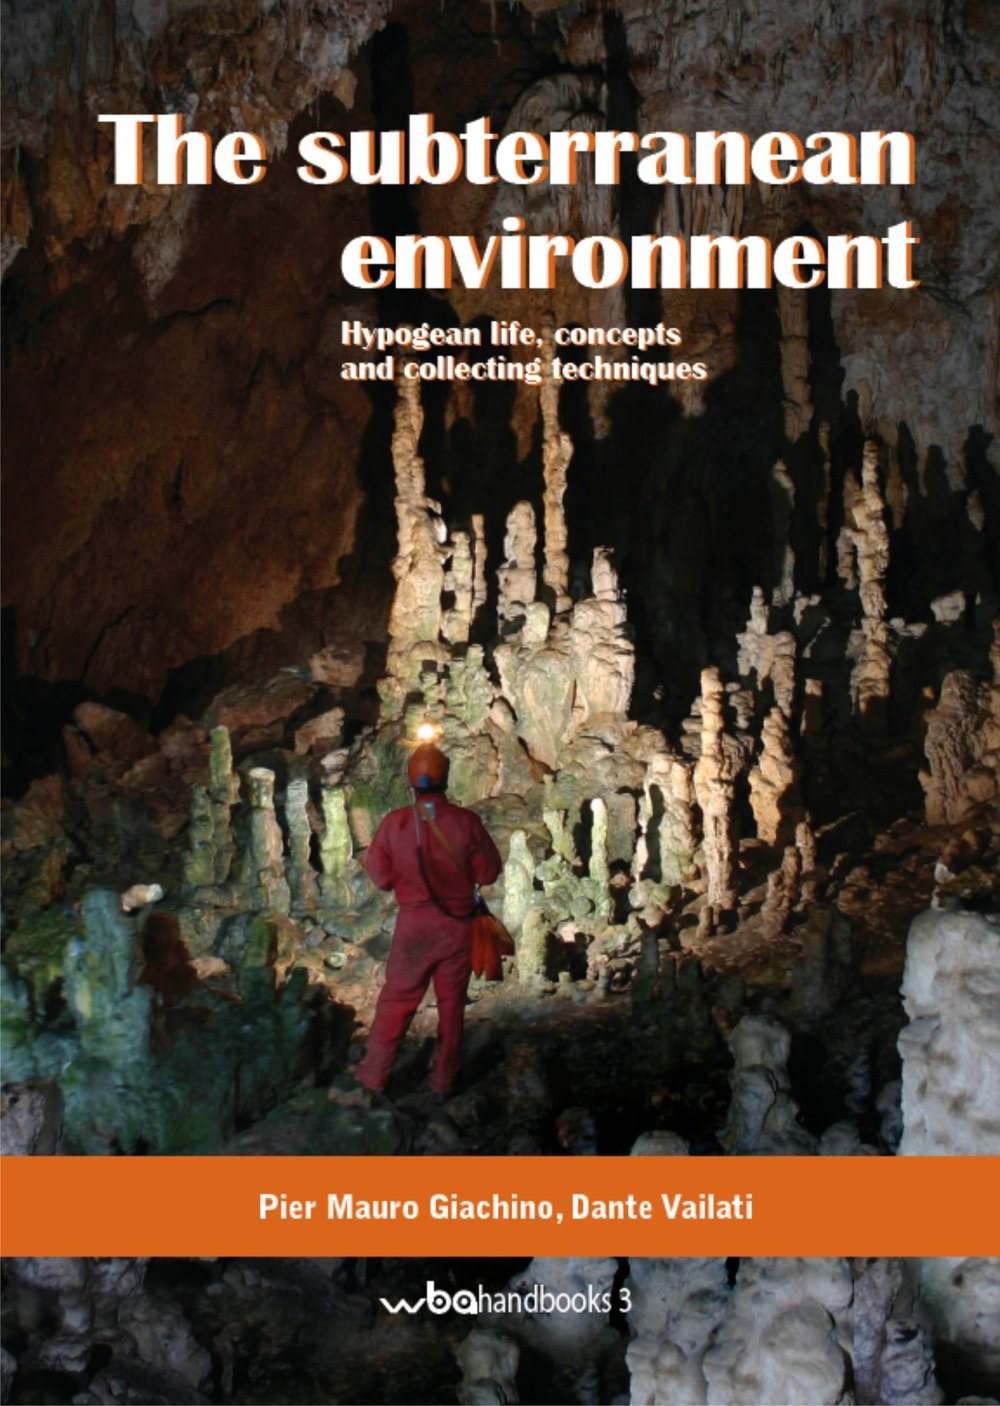 The subterranean environment. Hypogean life concepts and collecting techniques. Ediz. italiana e inglese (WBA Handbooks)